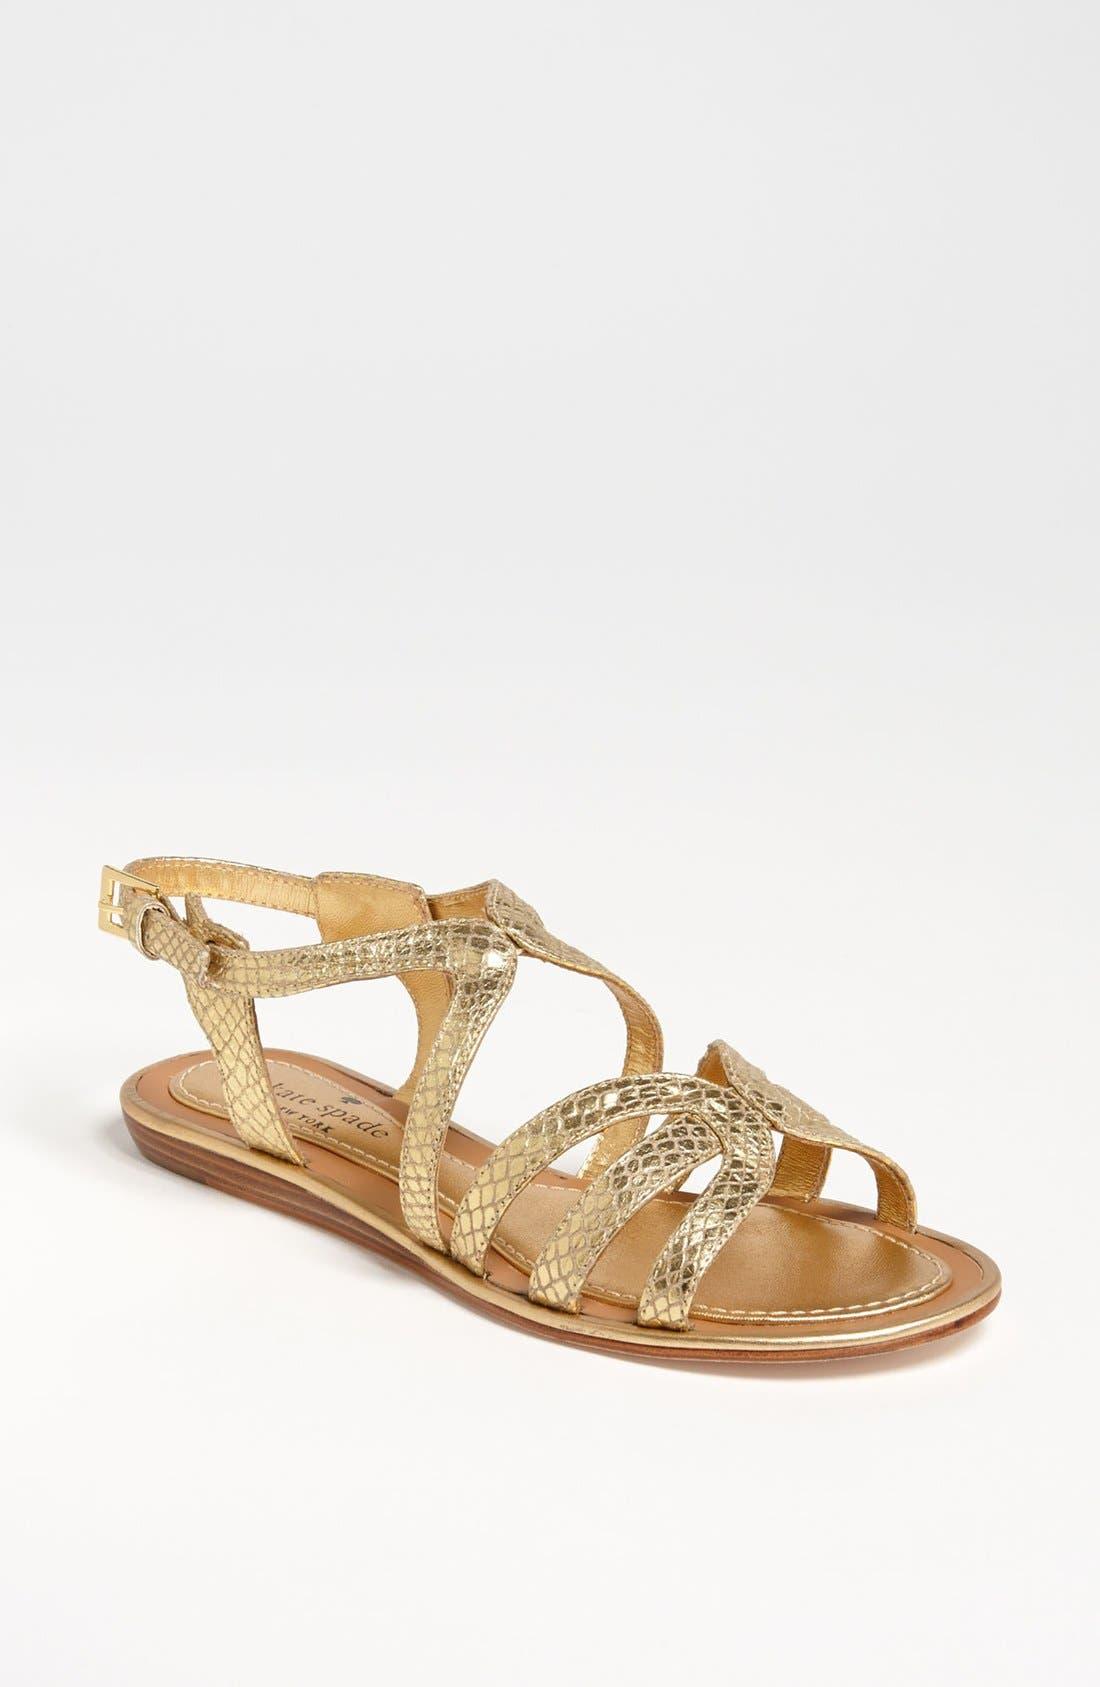 Alternate Image 1 Selected - kate spade new york 'intro' sandal